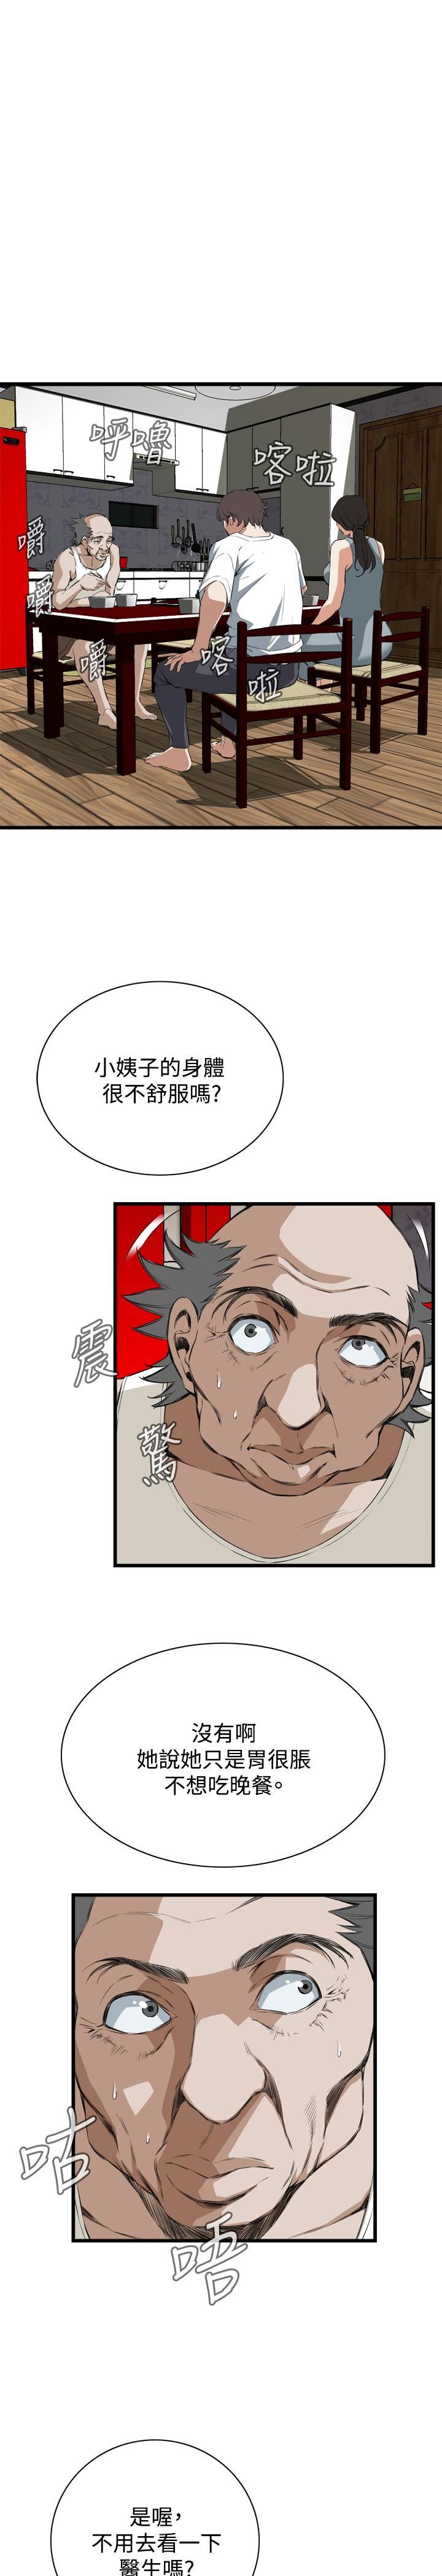 Take a Peek 偷窥 Ch.39~60 [Chinese]中文 415